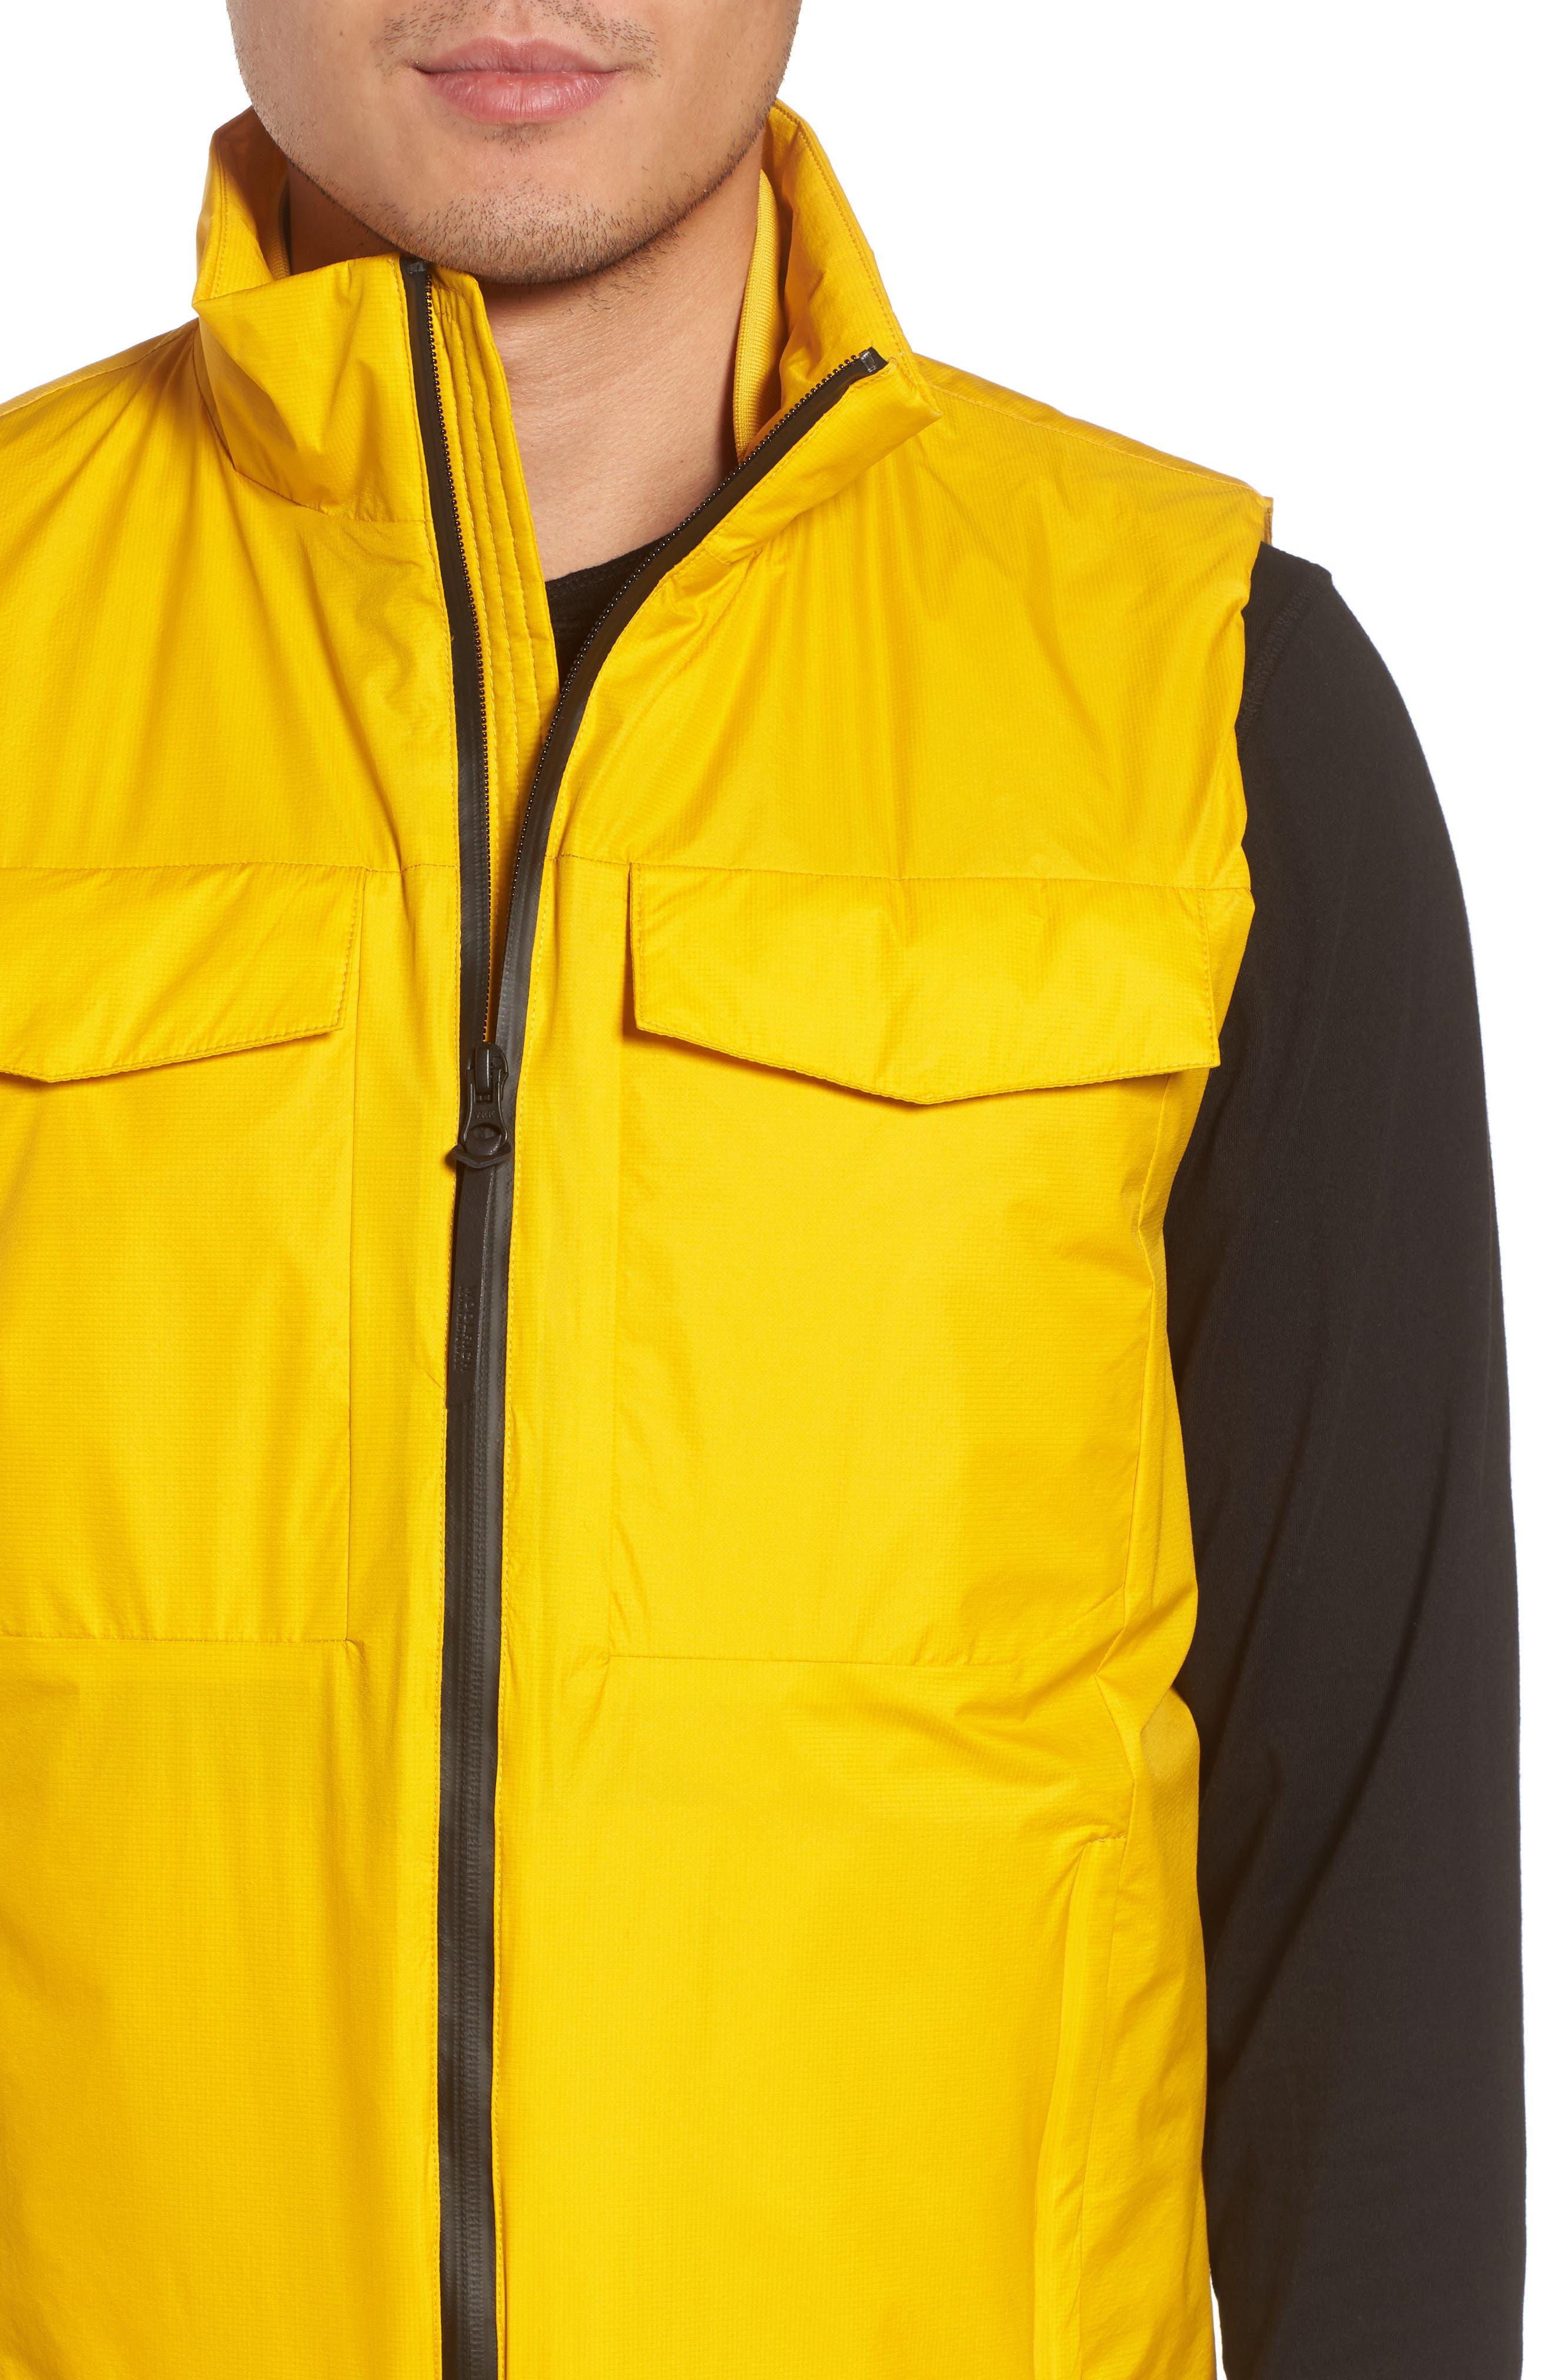 & Bros. Bering Vest,                             Alternate thumbnail 4, color,                             Golden Spice